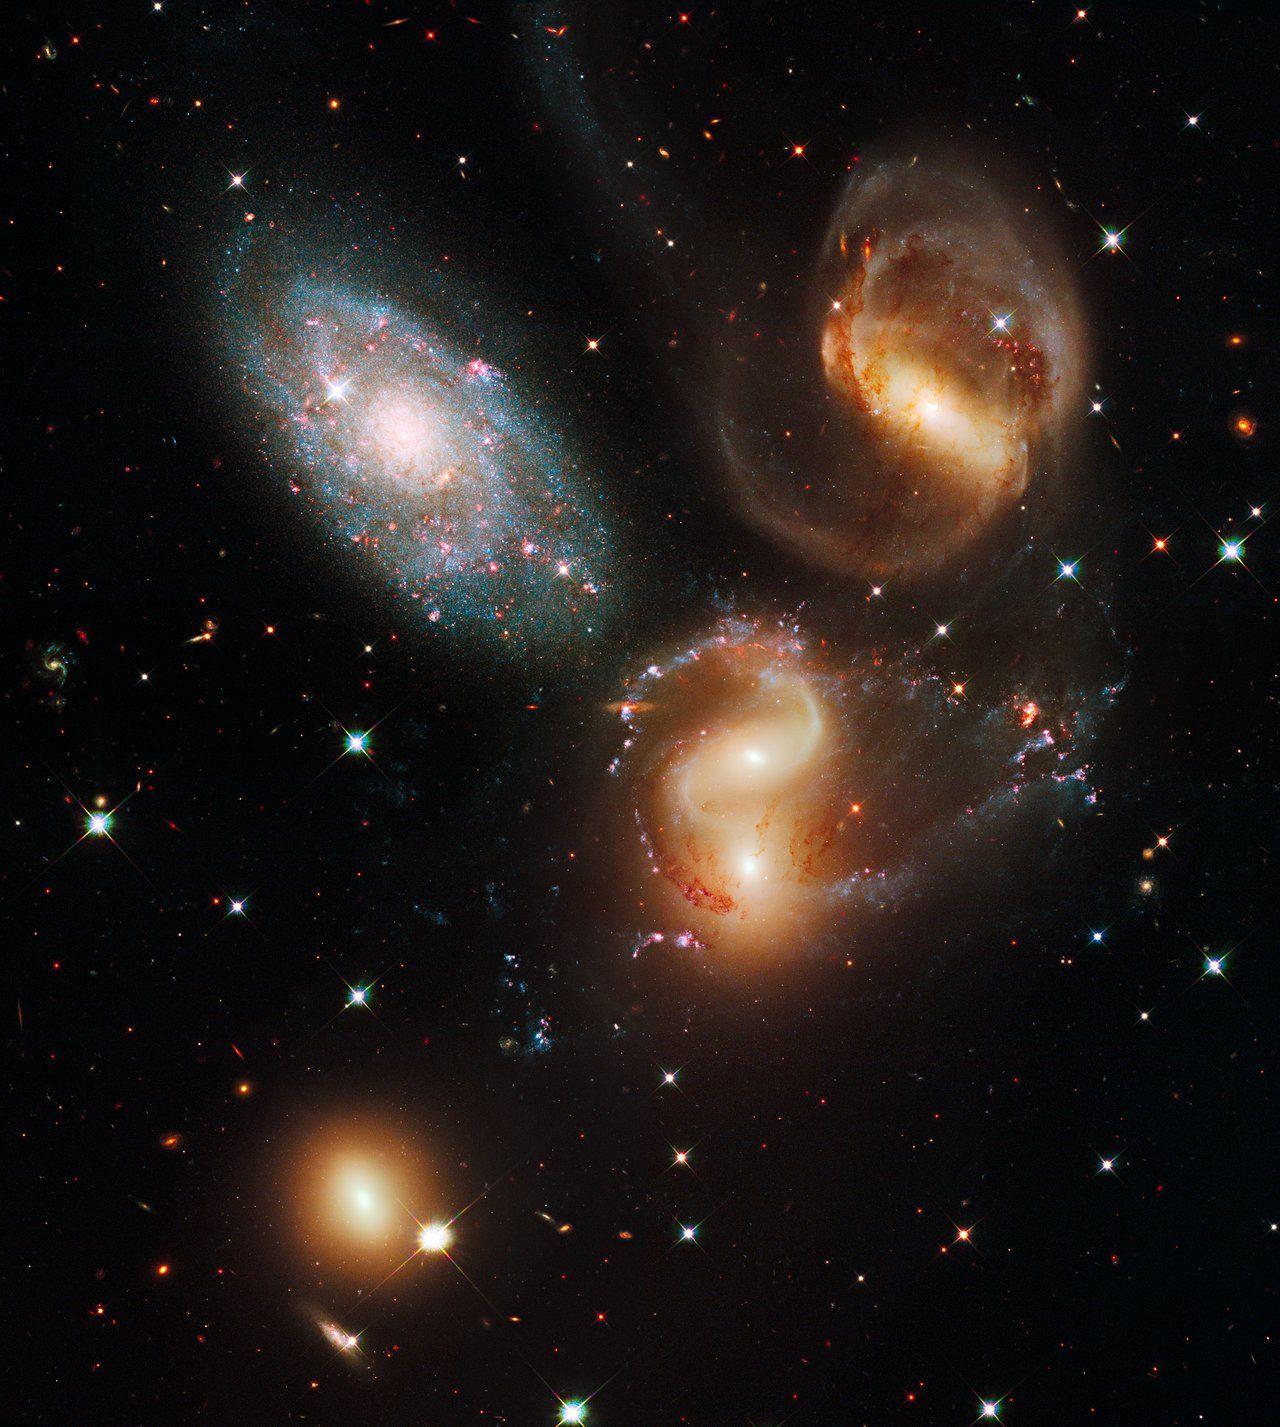 telescopio hubble | Planets and Space | Hubble space ...